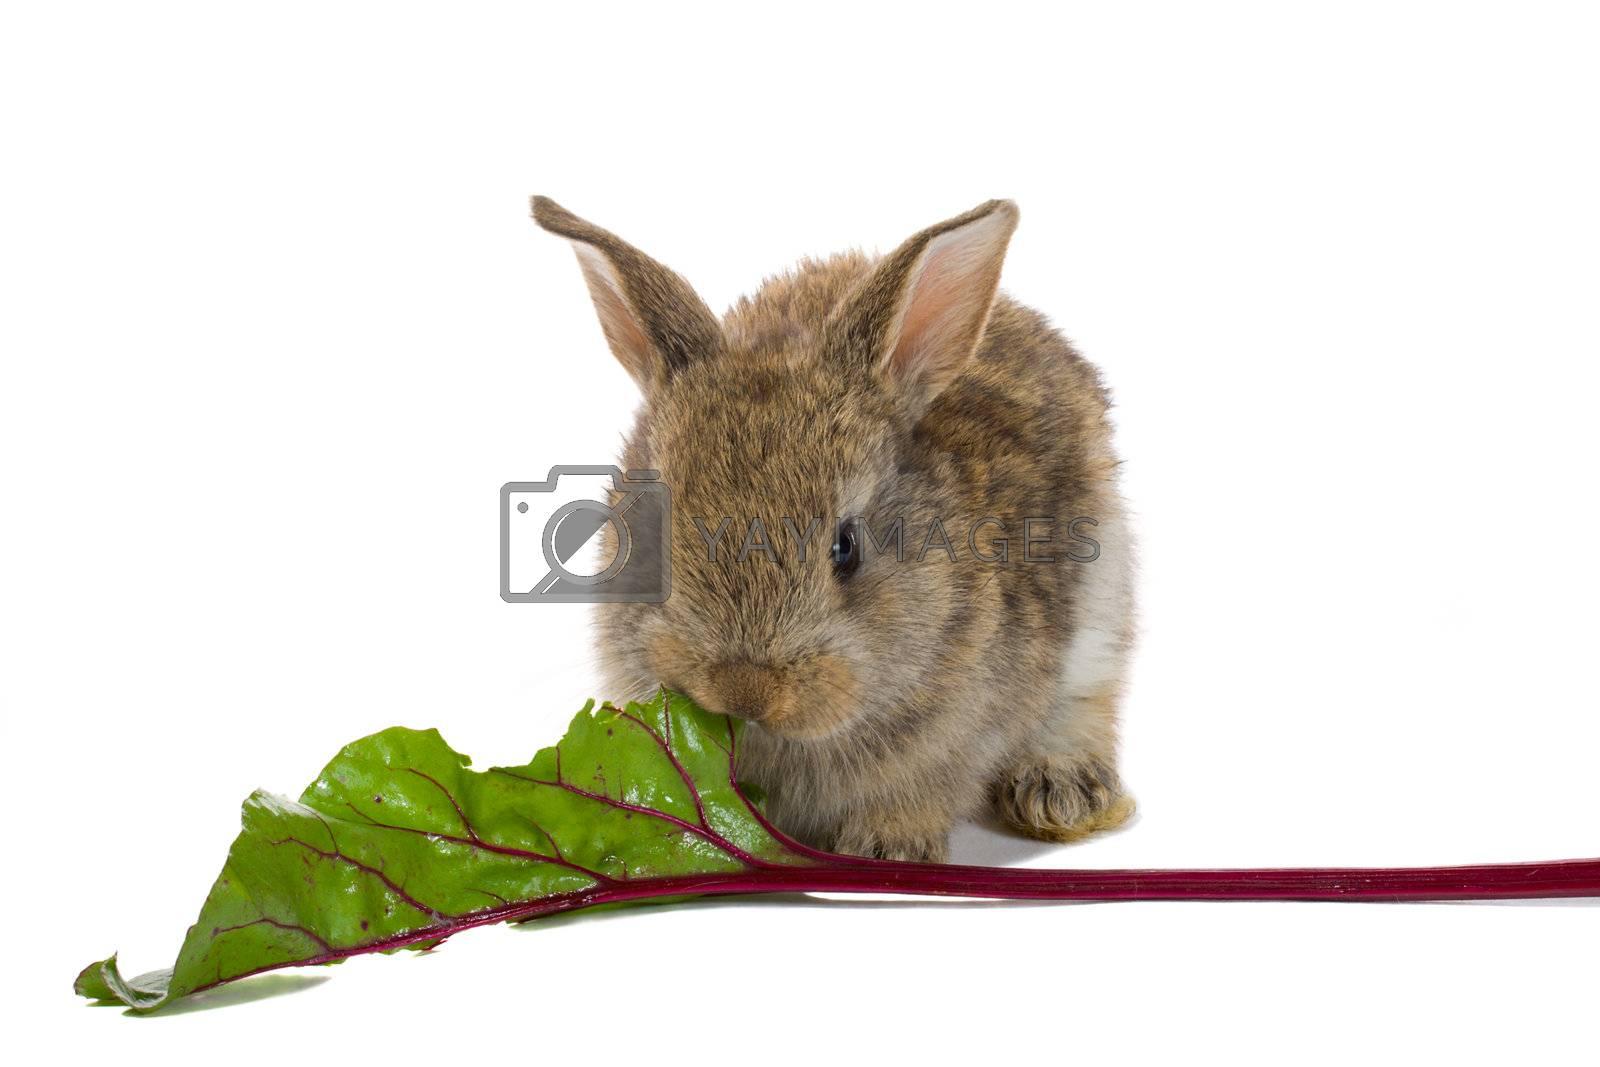 close-up baby rabbit eating, isolated on white